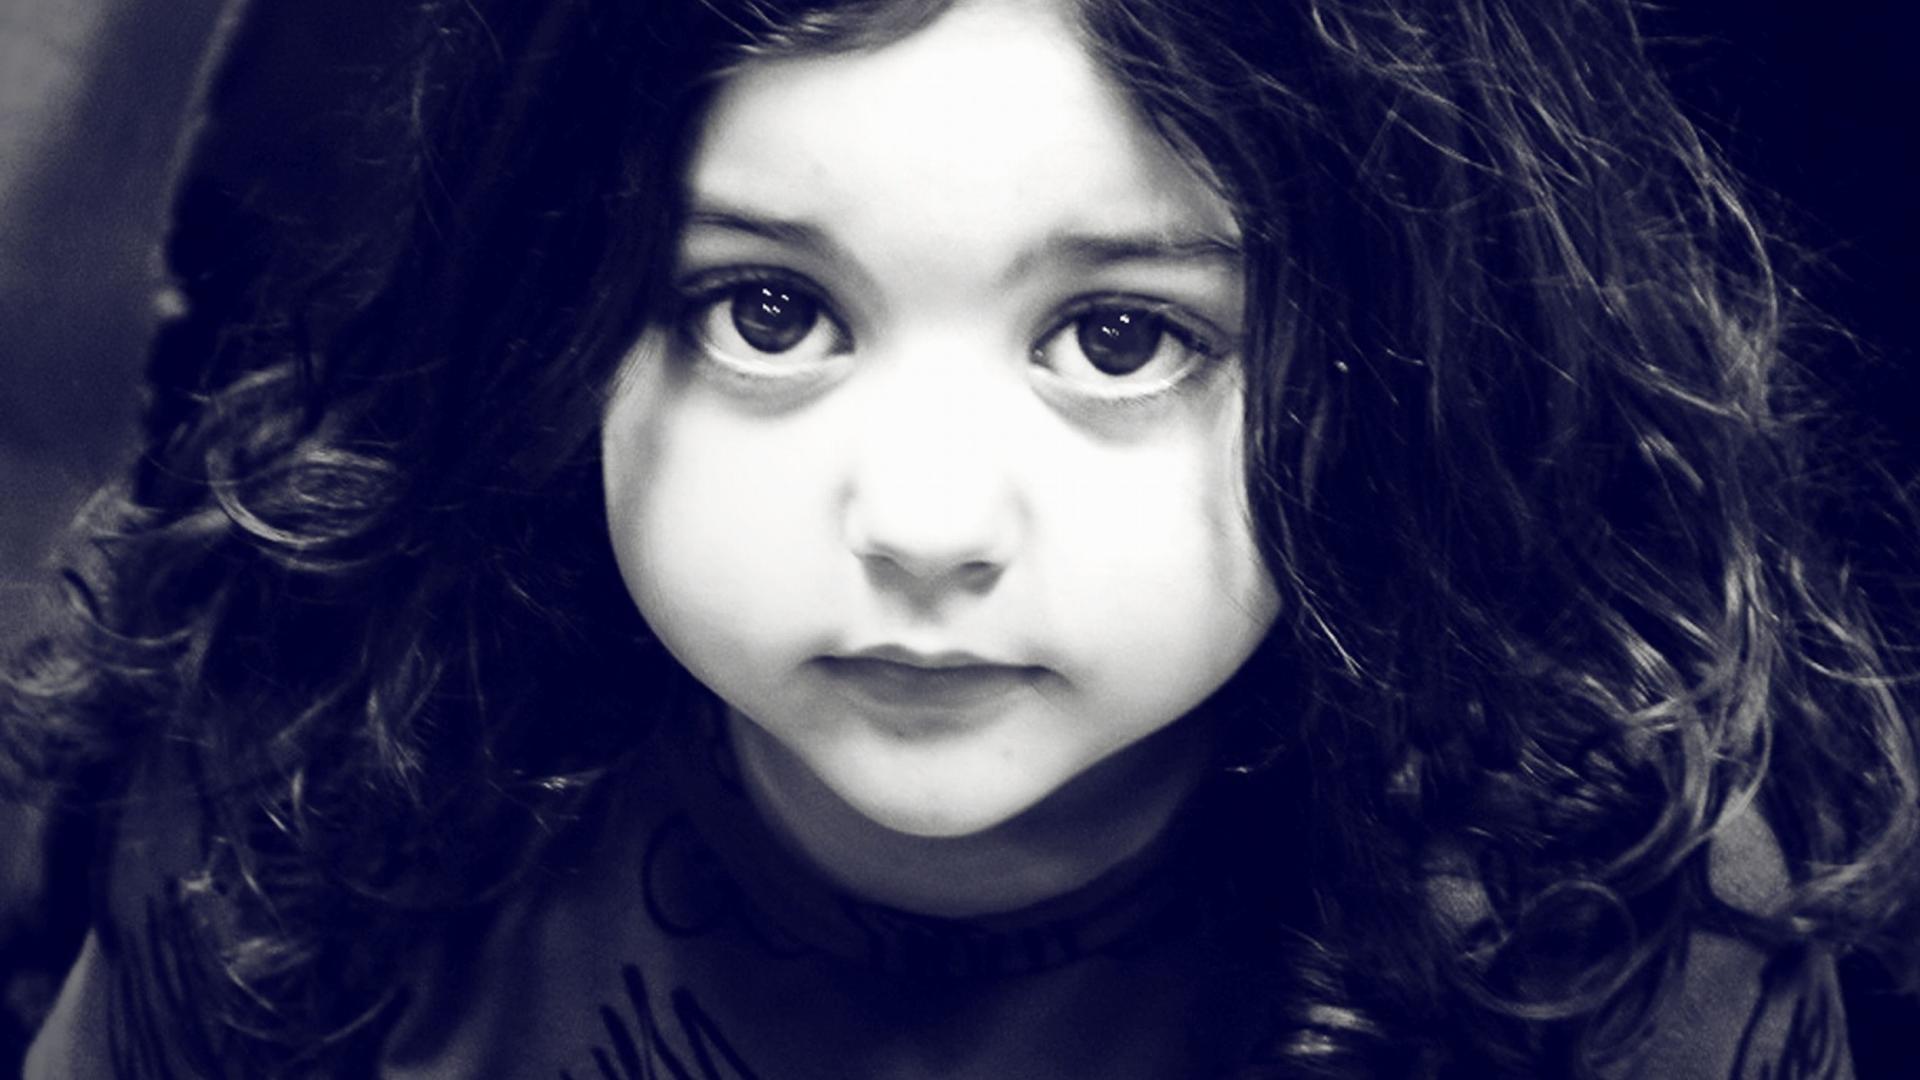 Cute Baby Girl Wallpaper Cute Sad Baby Girl Wallpaper